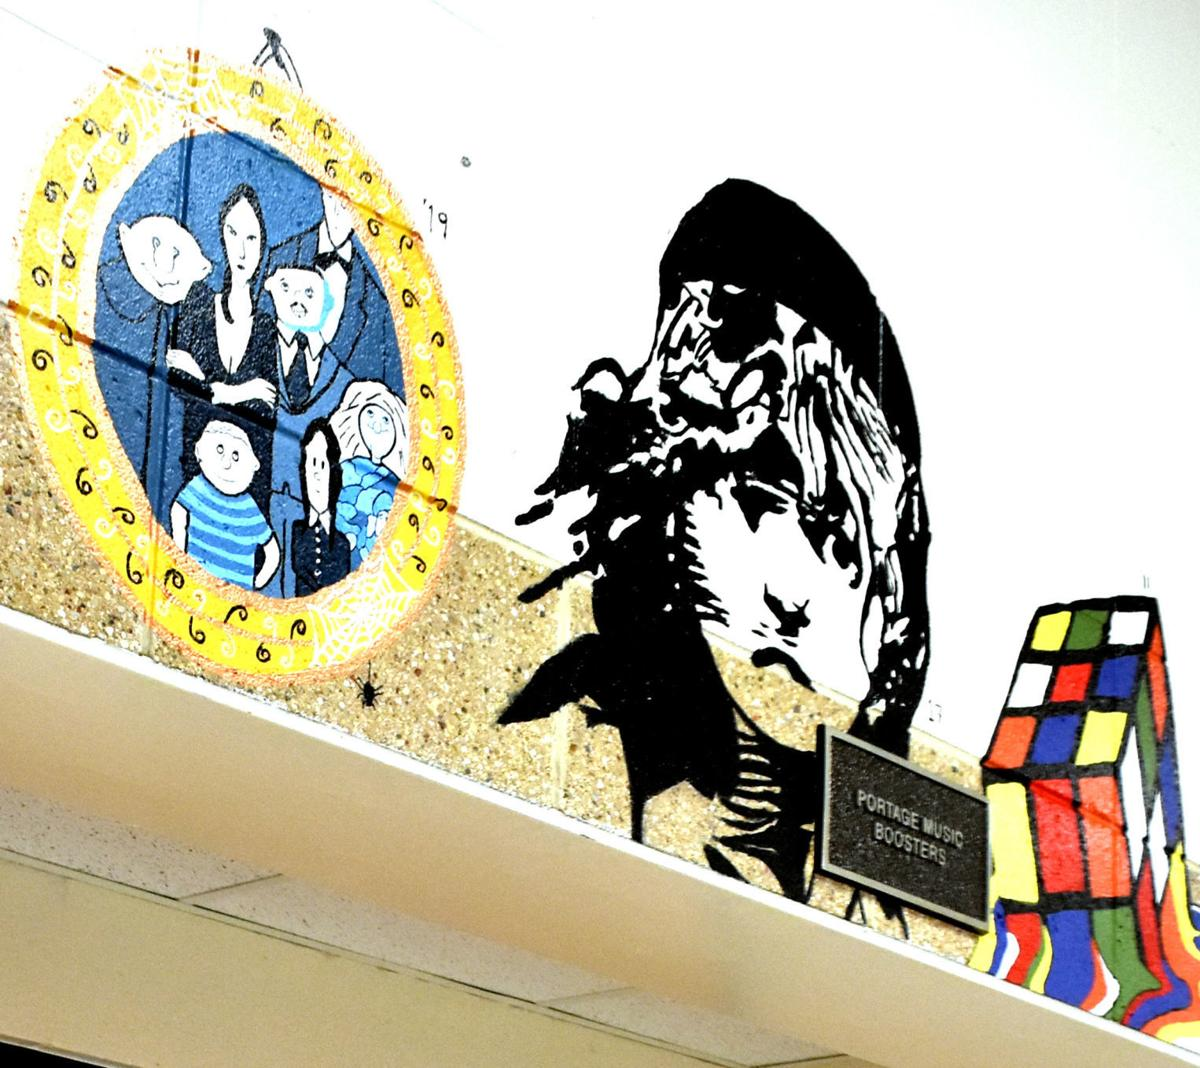 Portage paintings